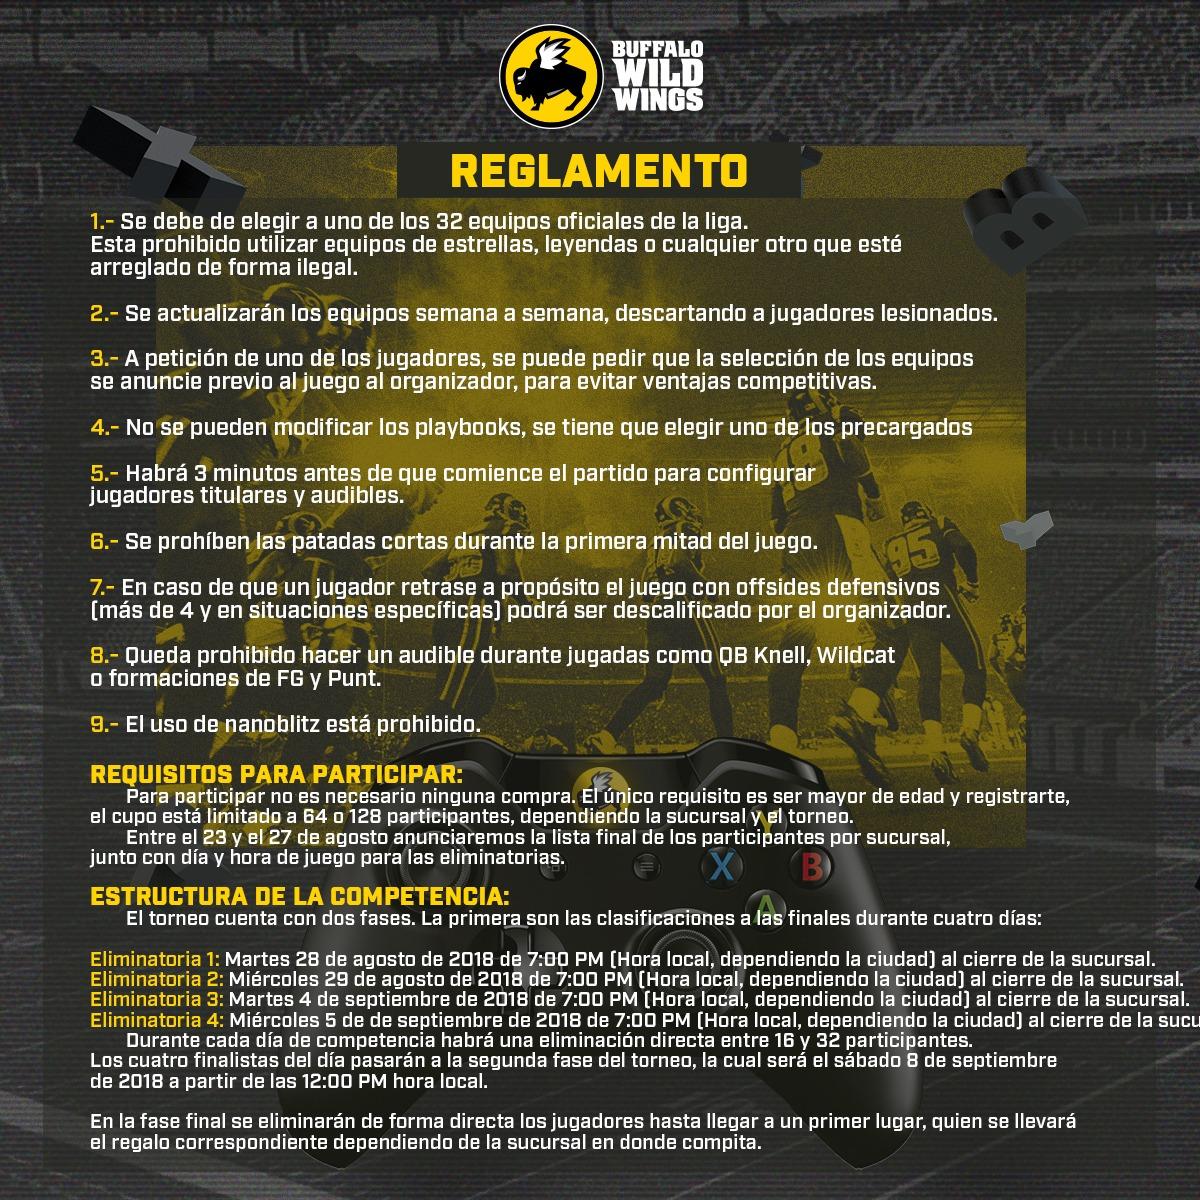 Reglamento del torneo de Madden NFL 19